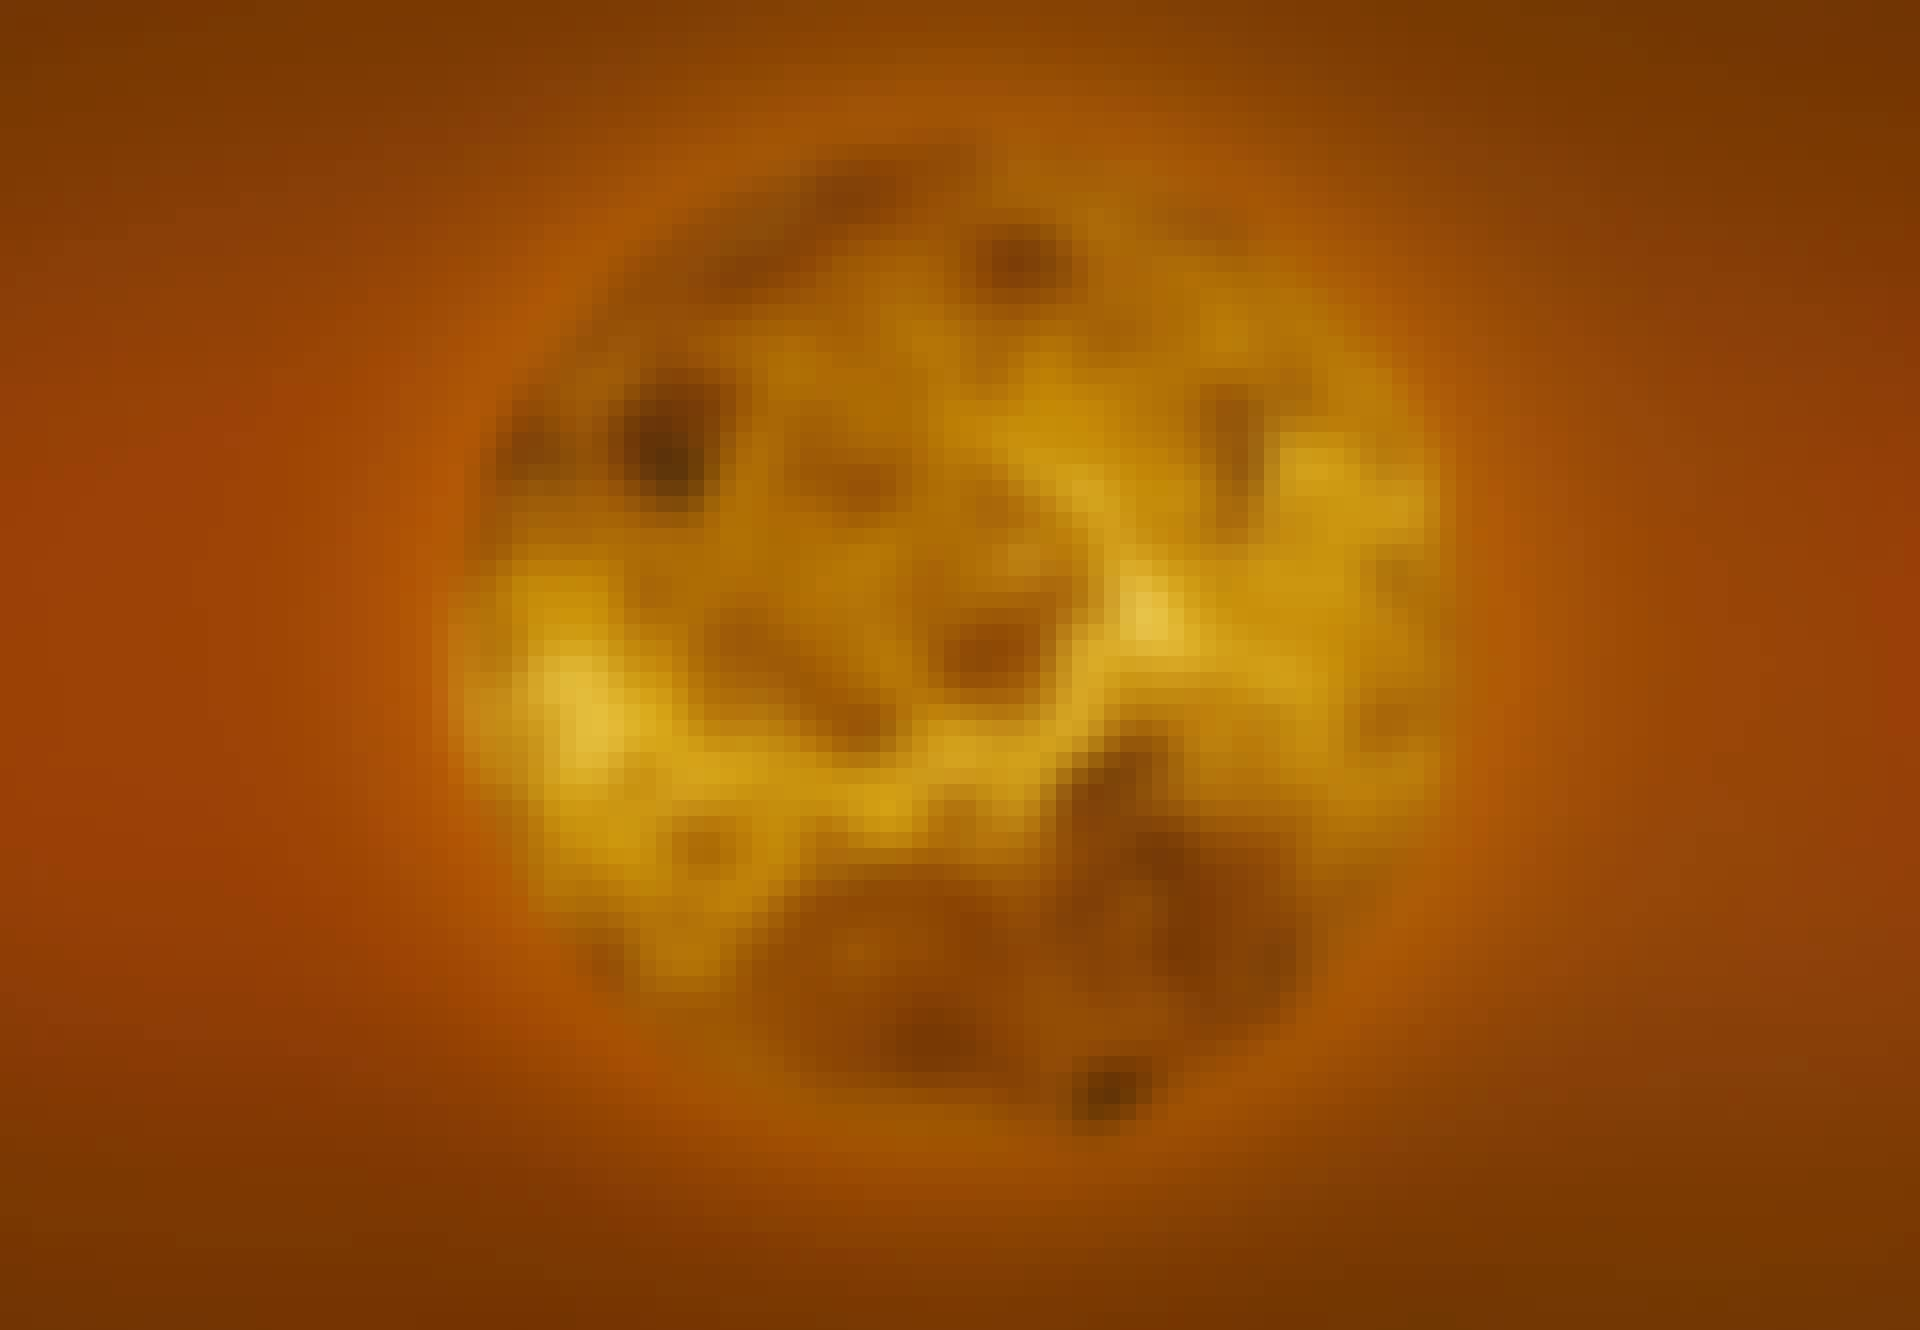 Liv på Venus - Planeten Venus